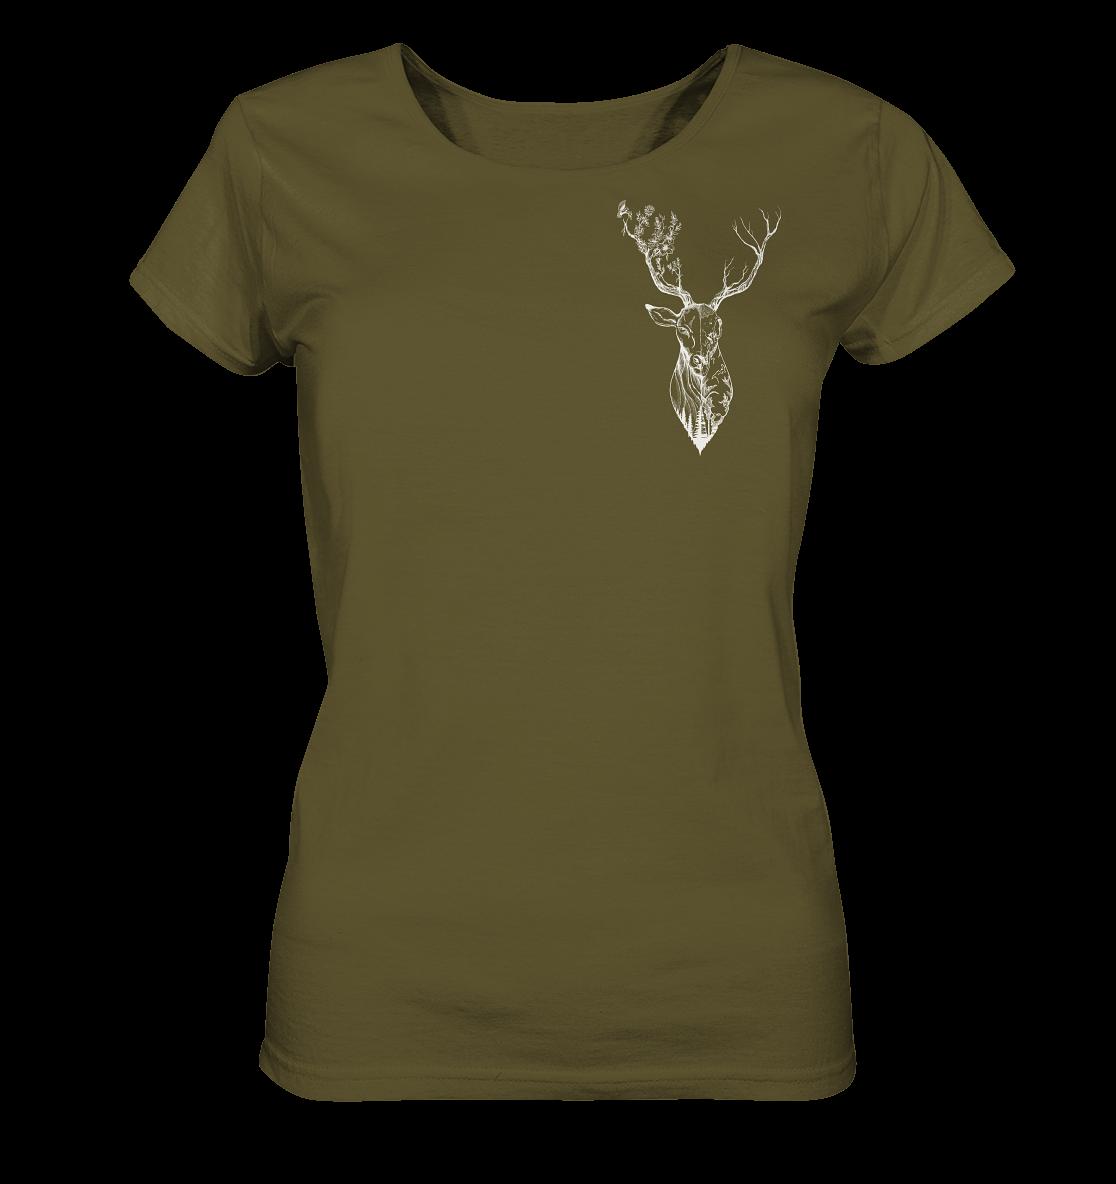 front-ladies-organic-shirt-5e5530-1116x-6.png